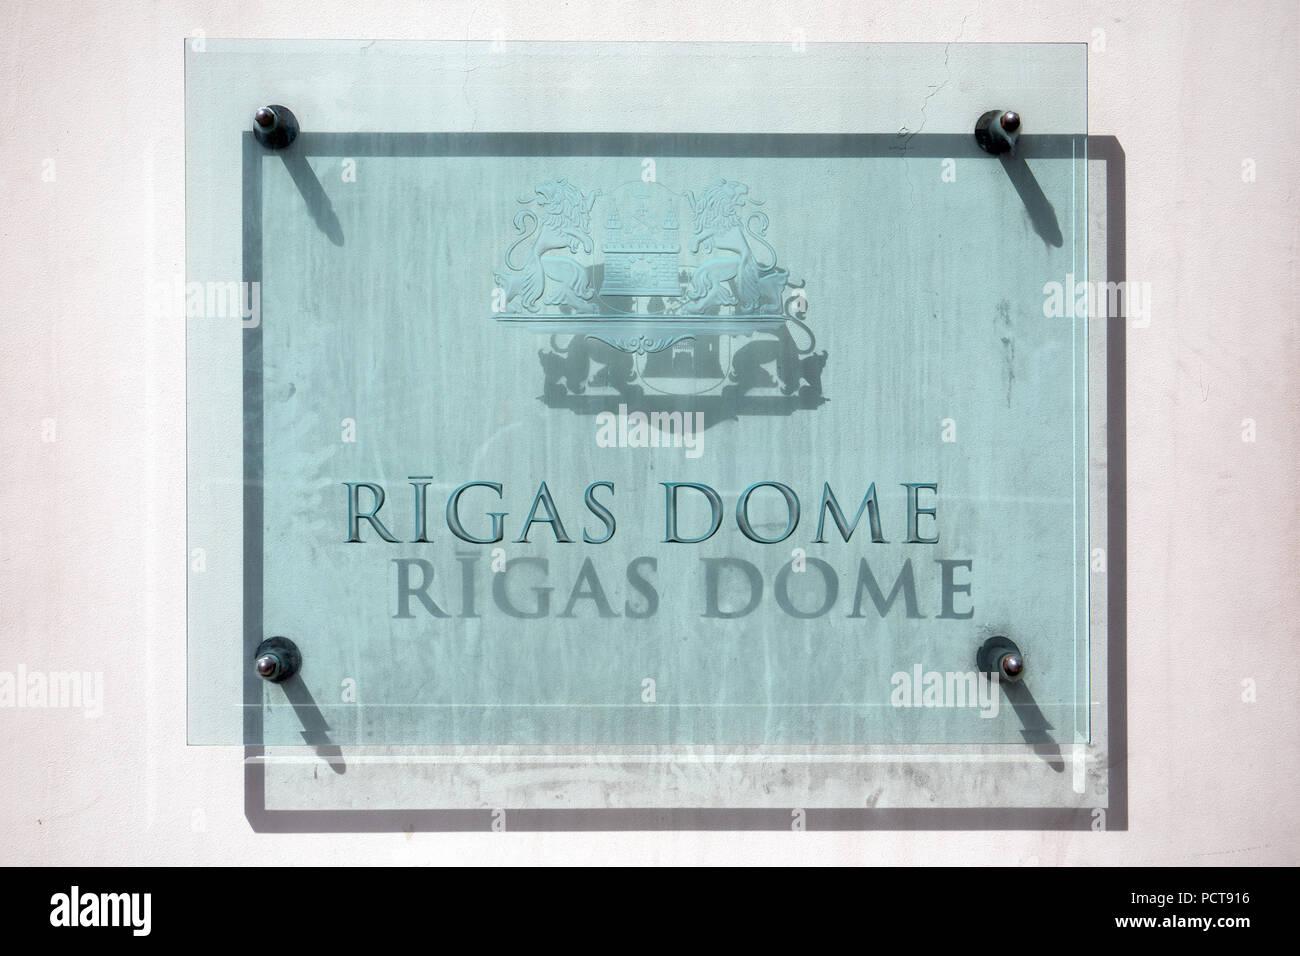 Inscription Town hall of Riga in Latvian - Rigas dome - Stock Image